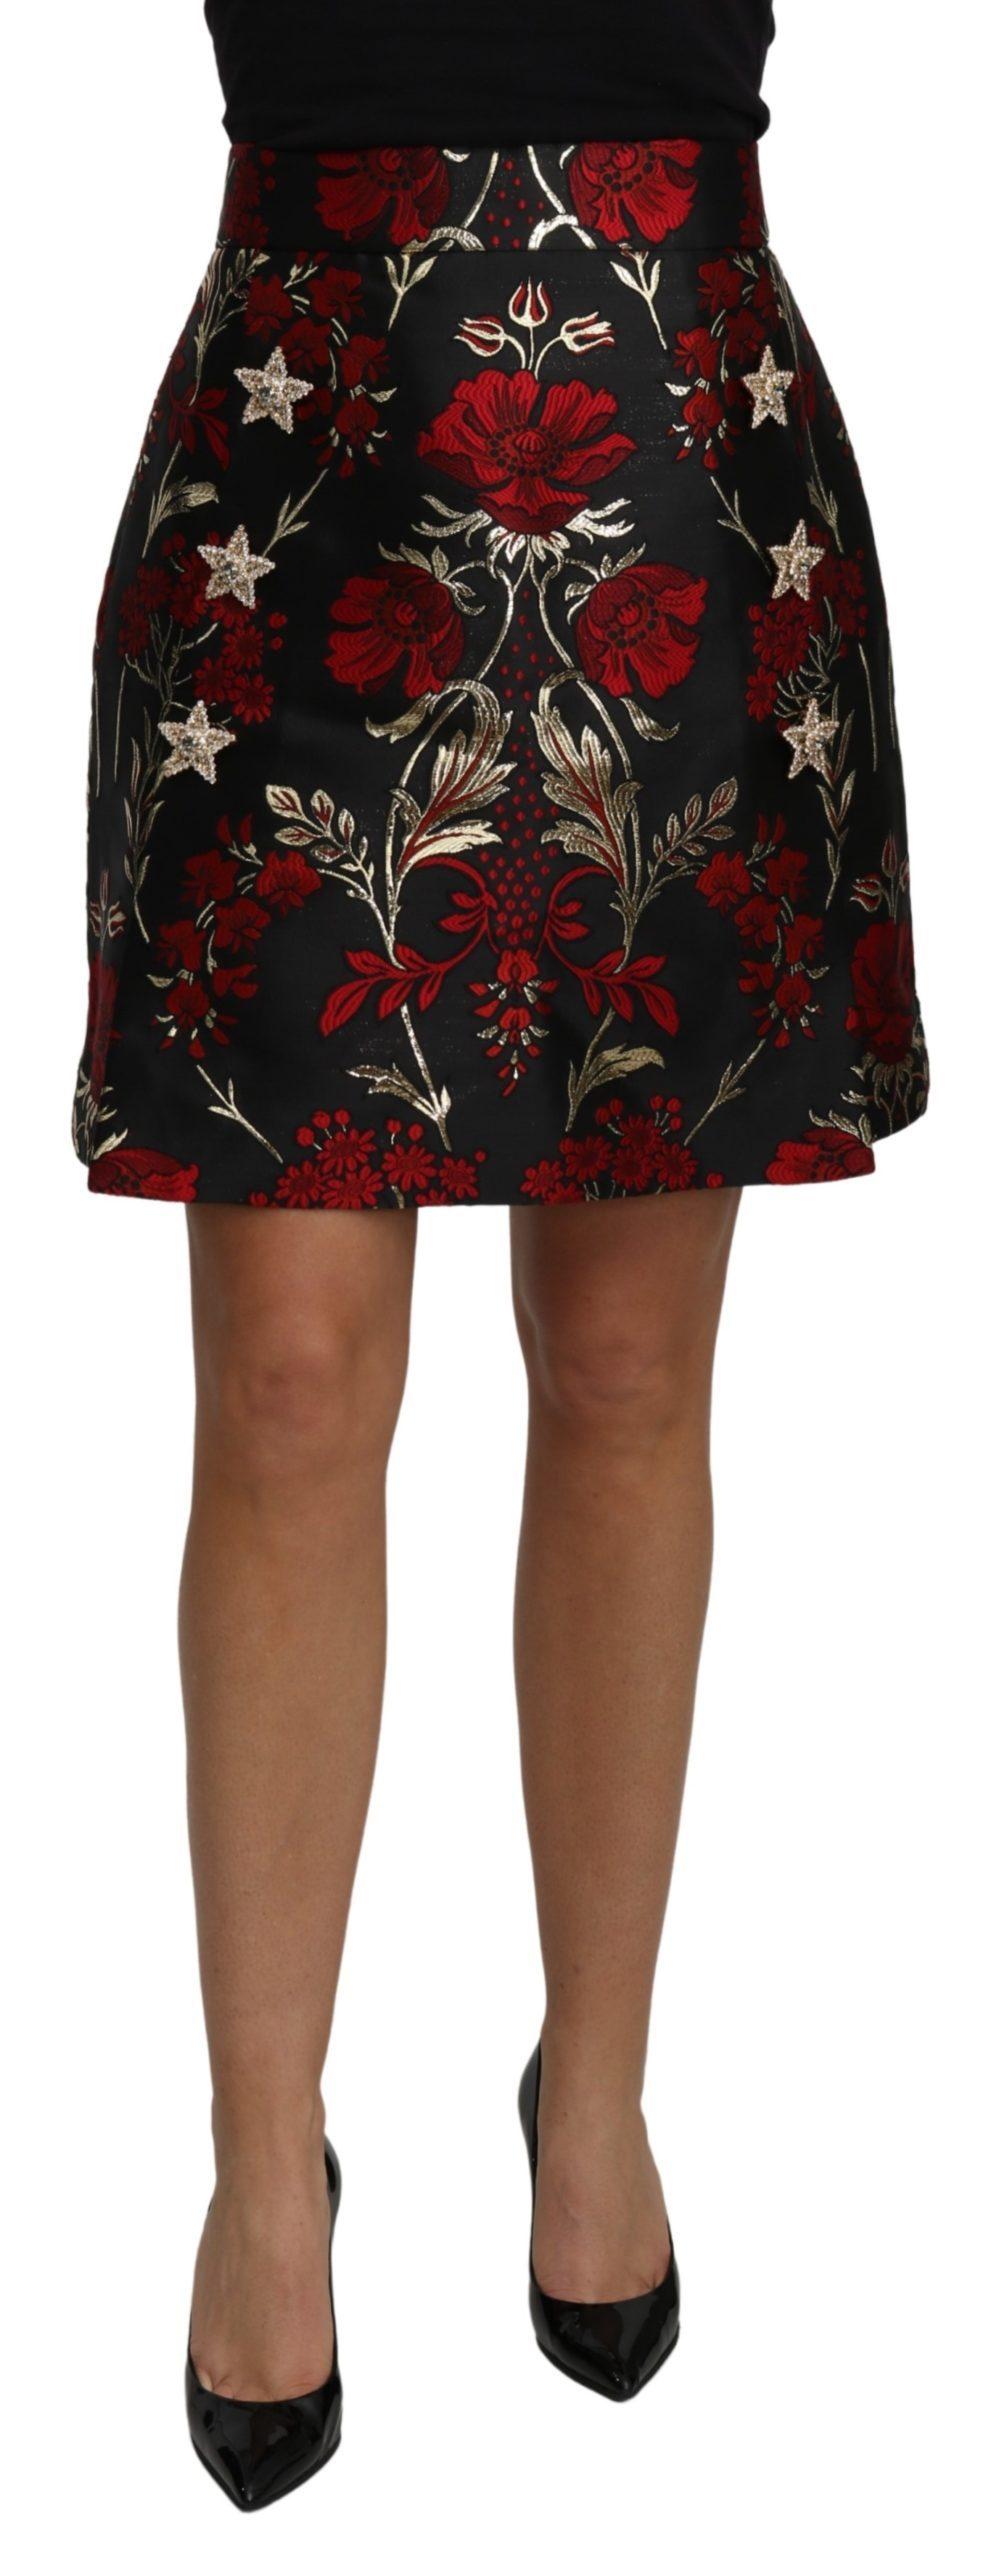 Dolce & Gabbana Women's Floral Jacquard High Waist Mini Skirt Black SKI1464 - IT44 L